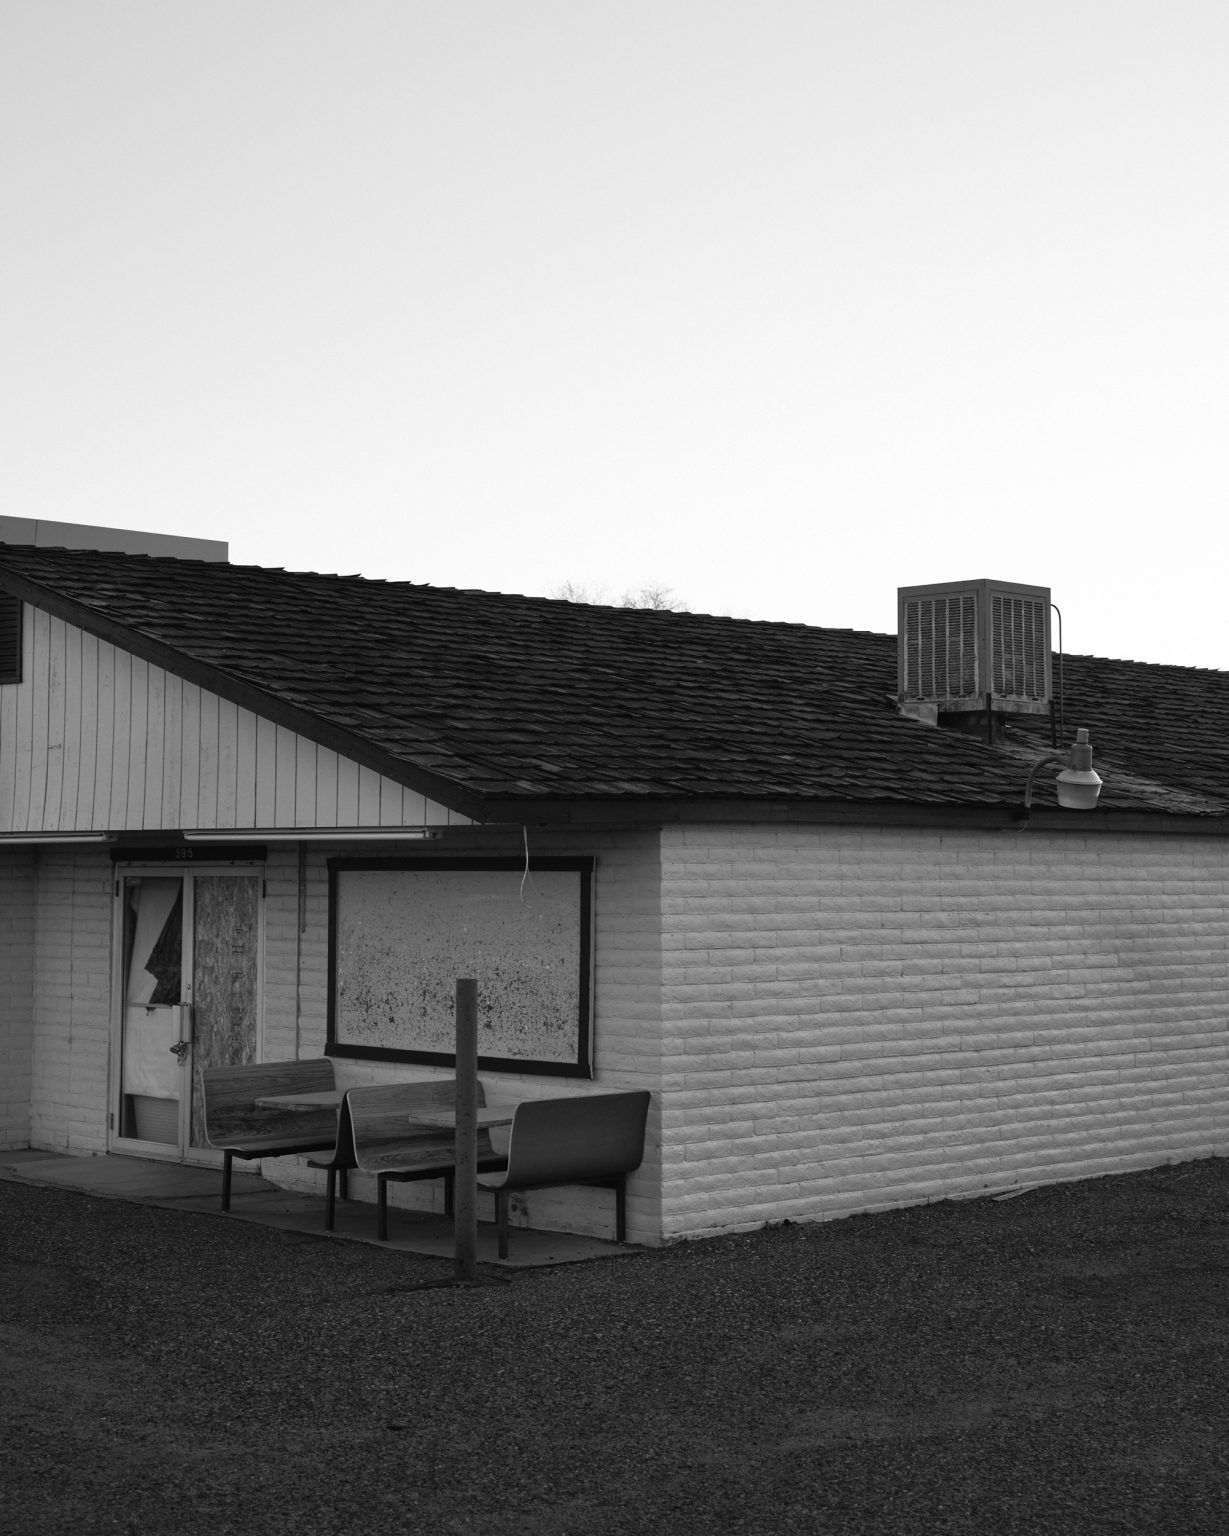 Closed diner near North Rim of the Grand Canyon. Utah 2020